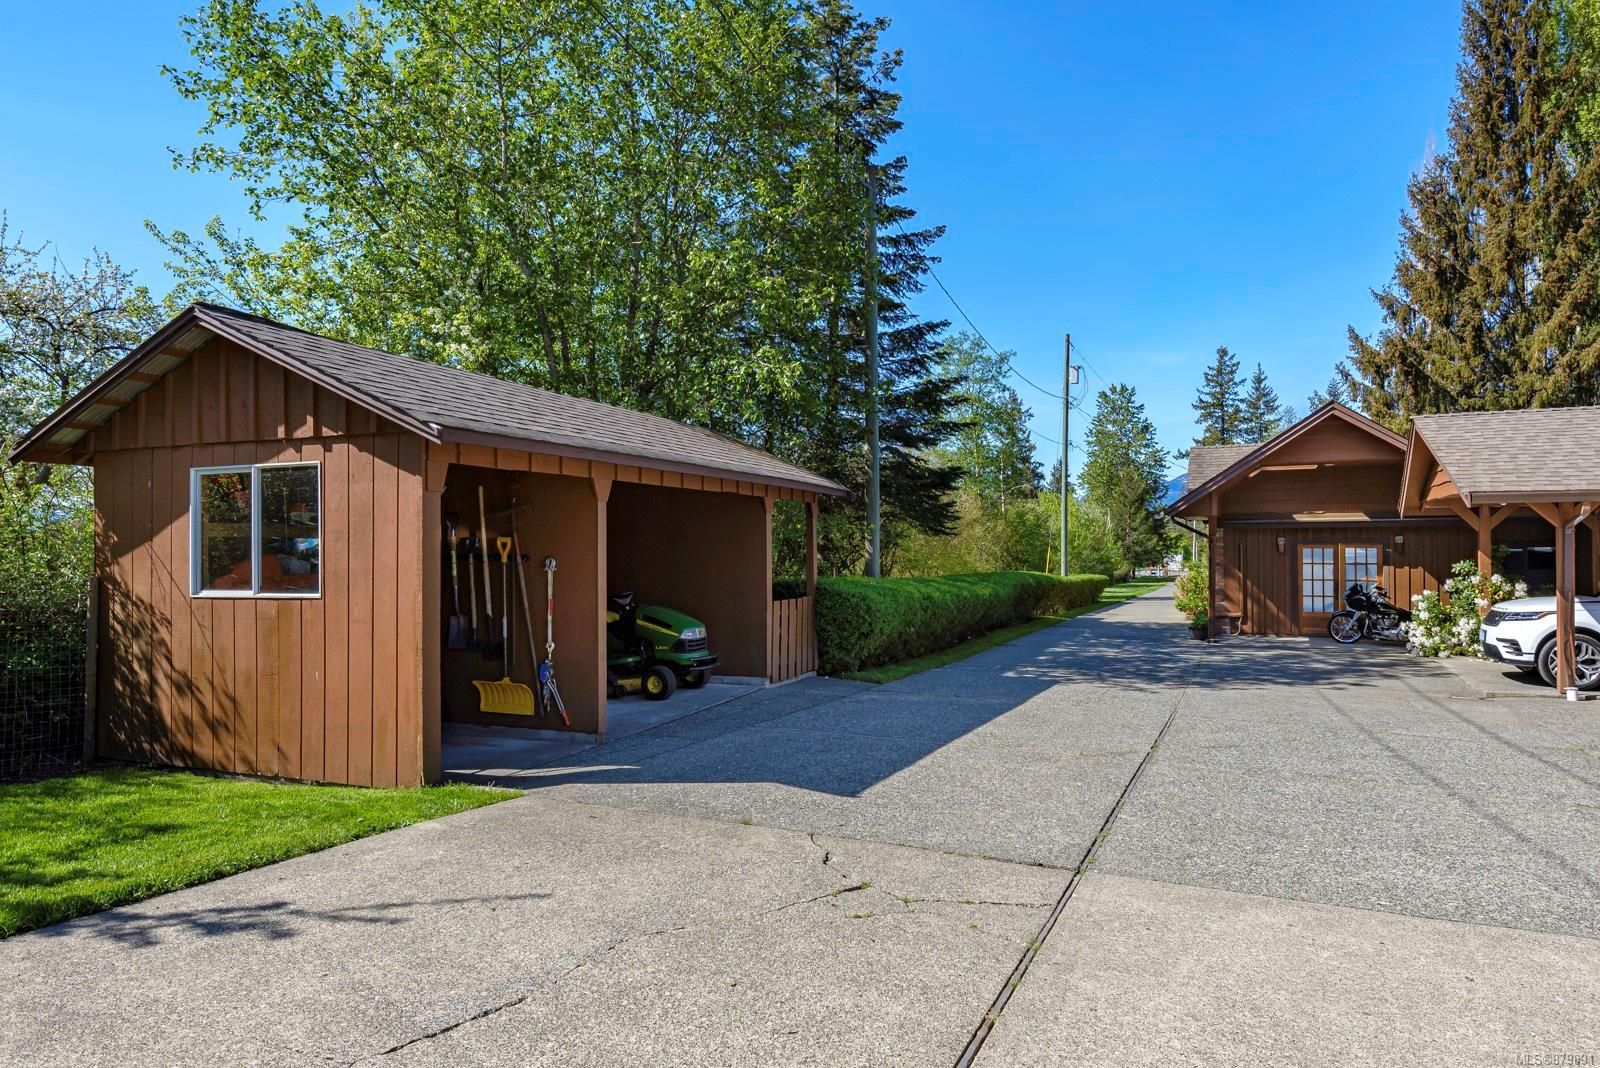 Photo 21: Photos: Vancouver Island Horse Property